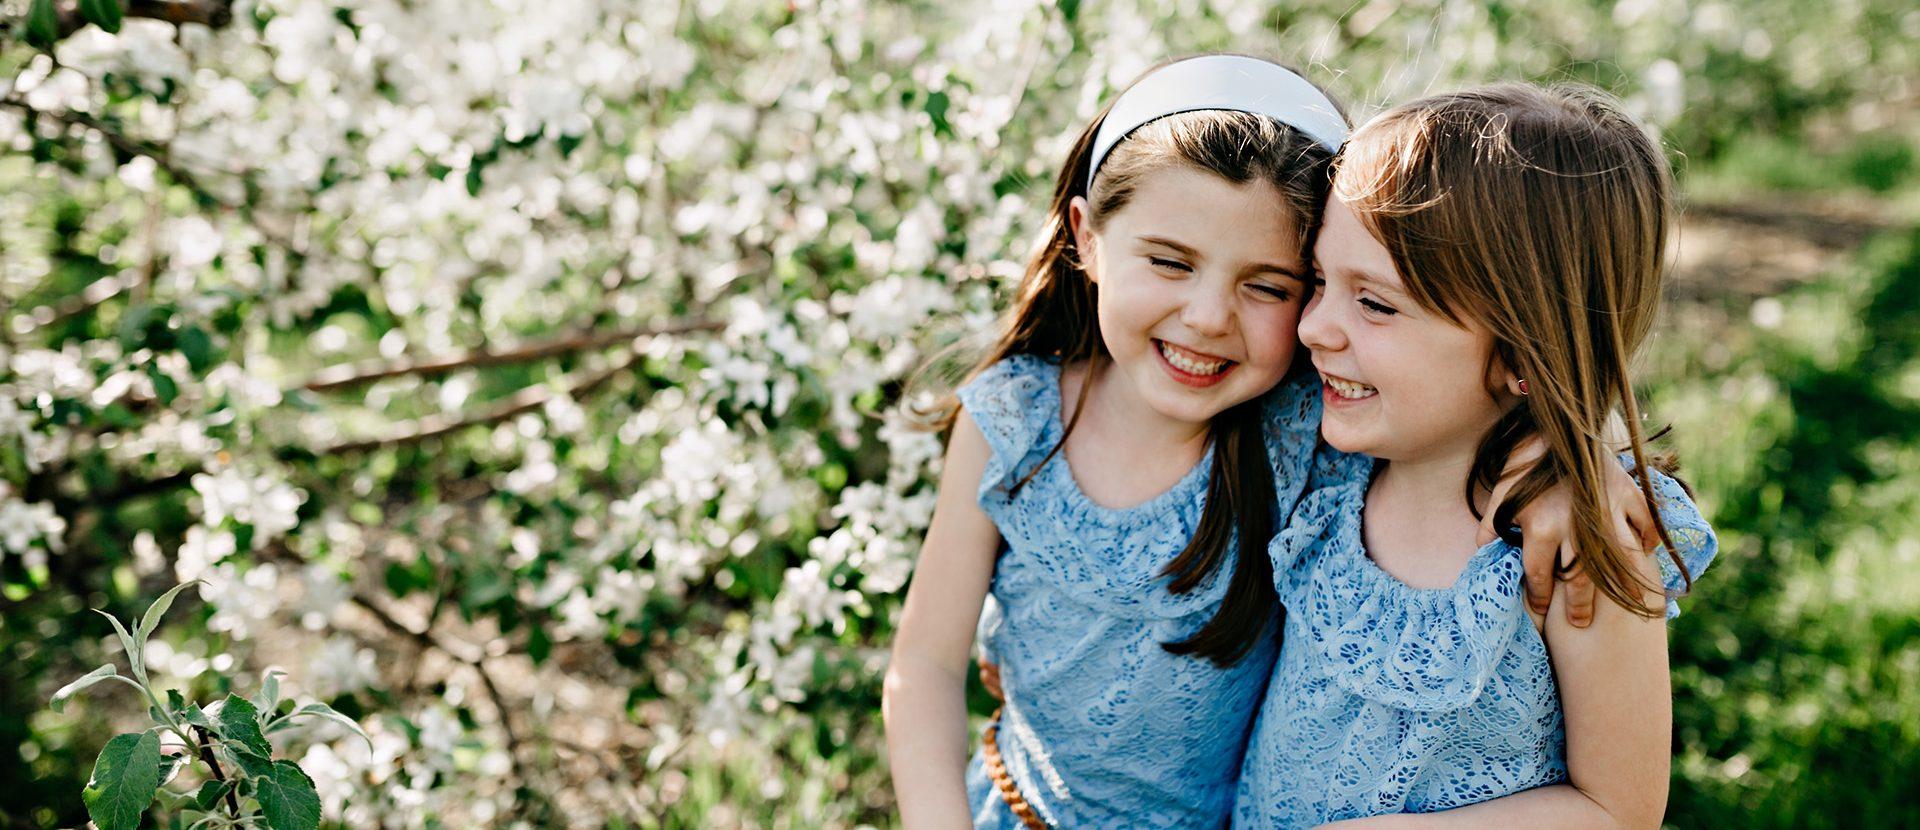 girls smiling and hugging